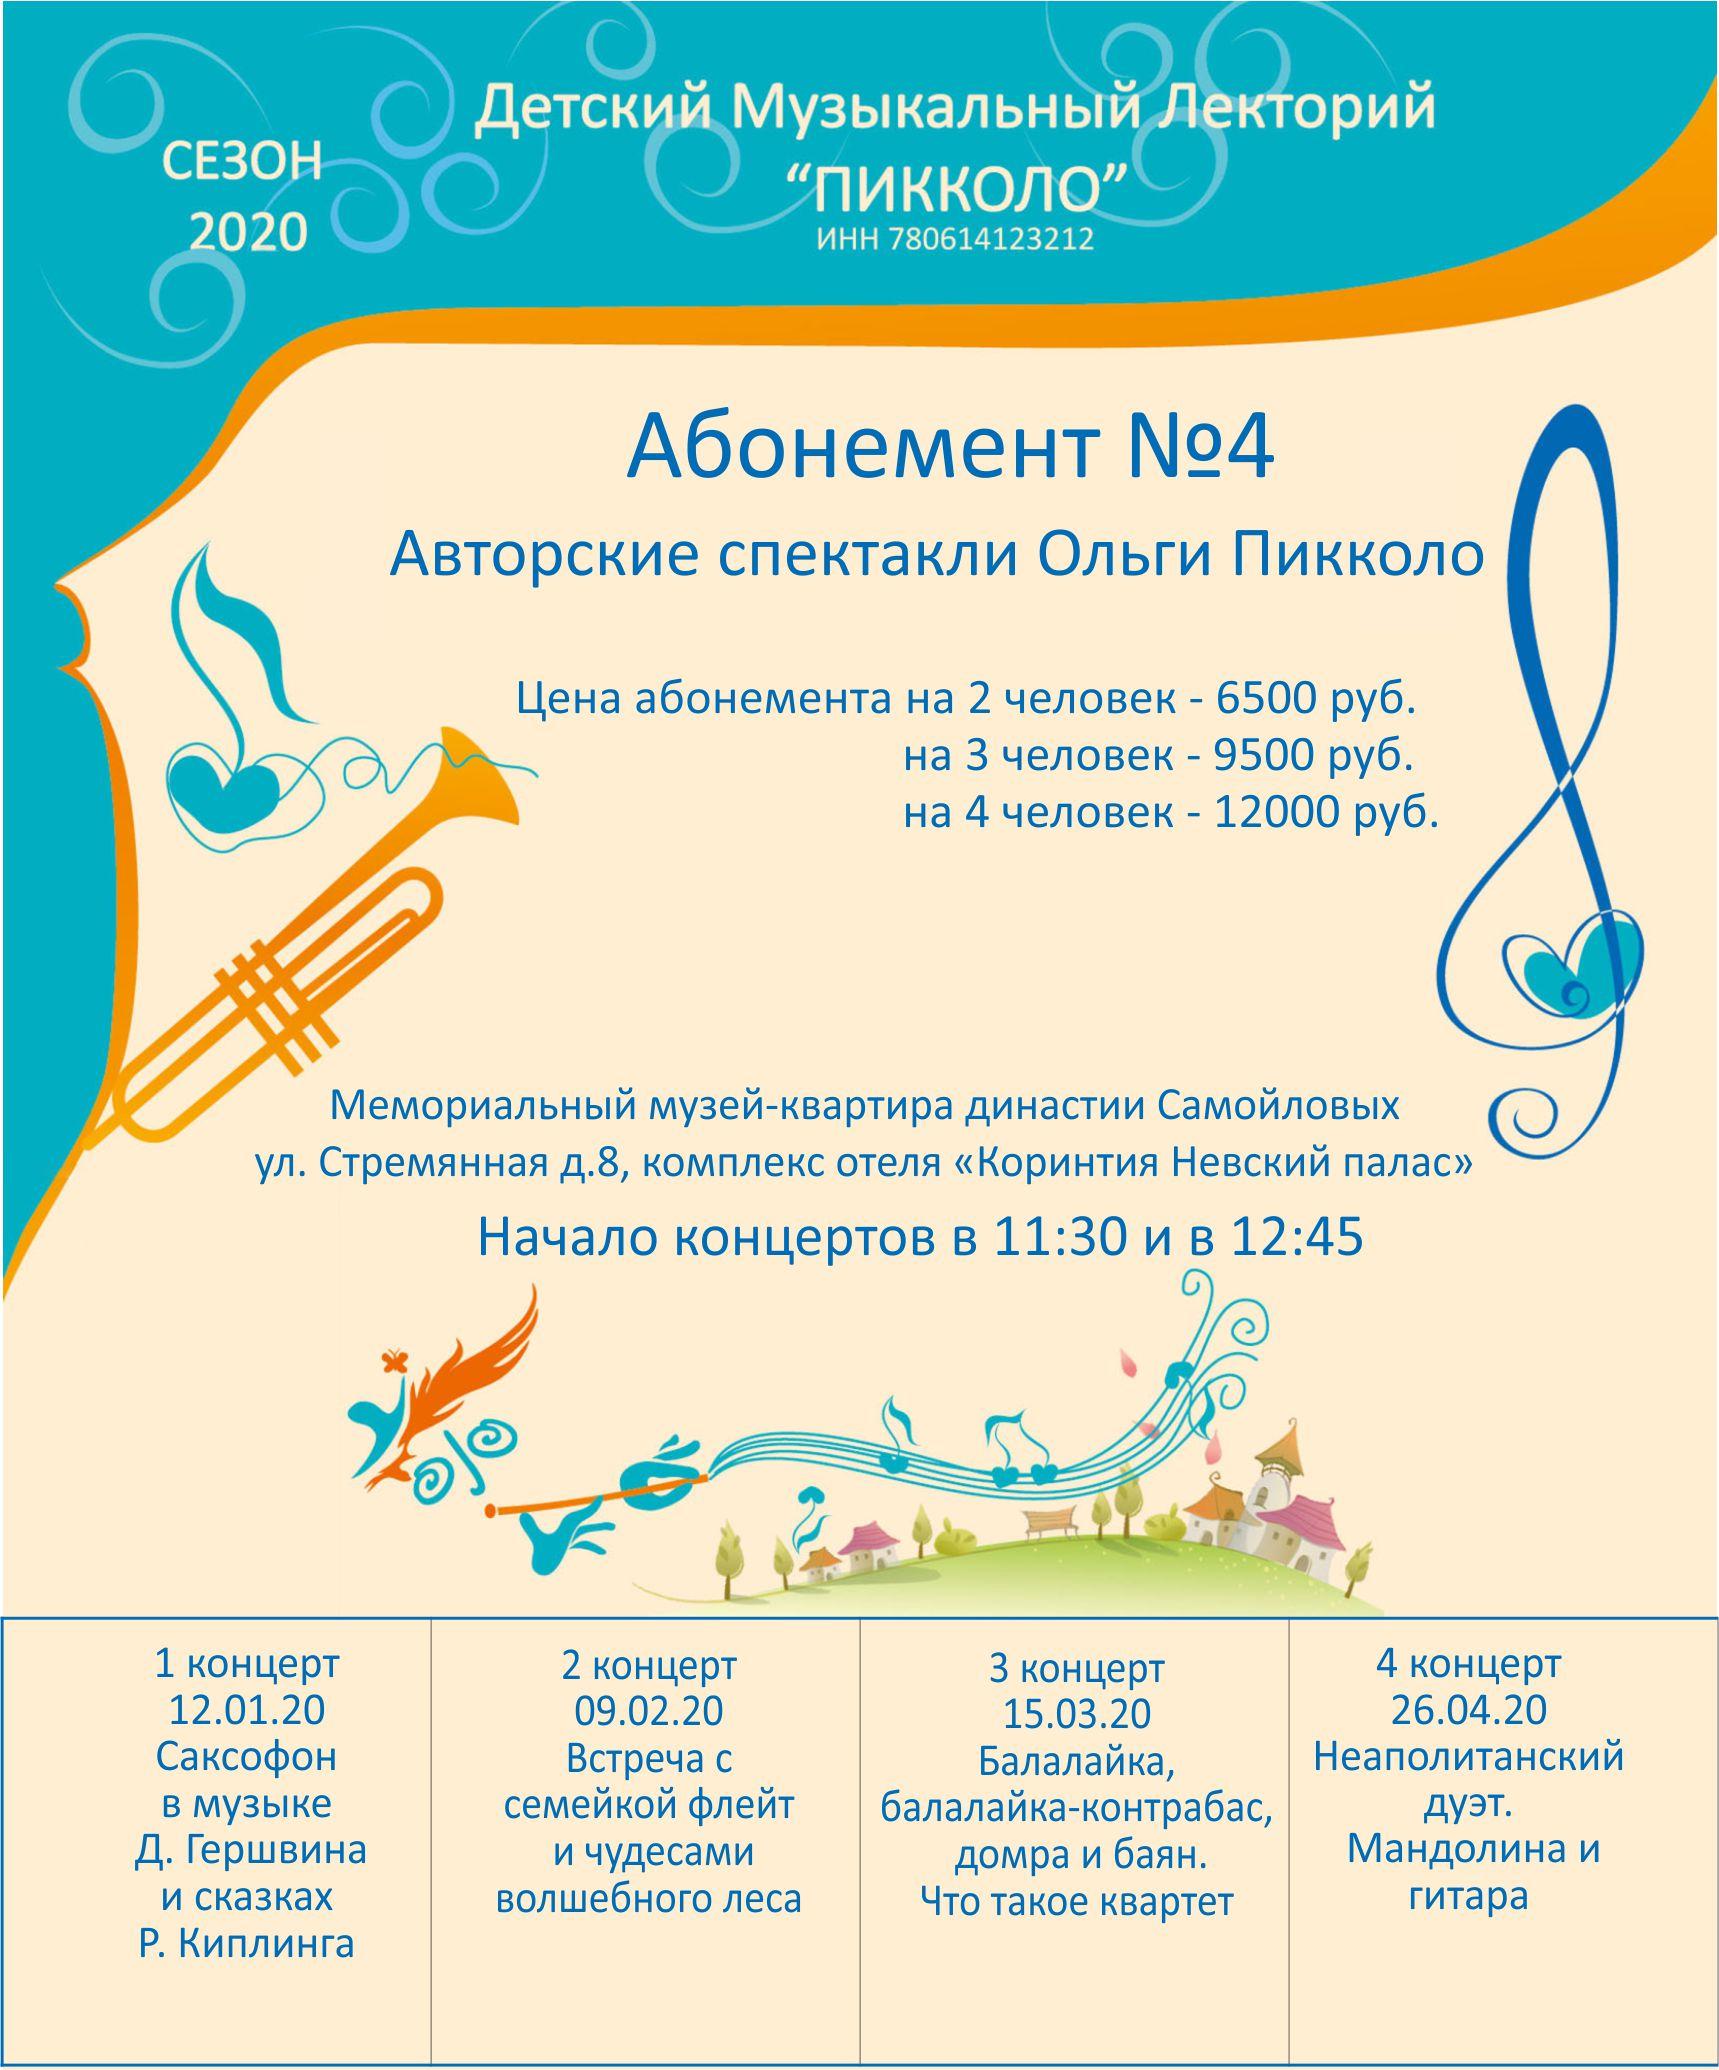 Абонемент4-1